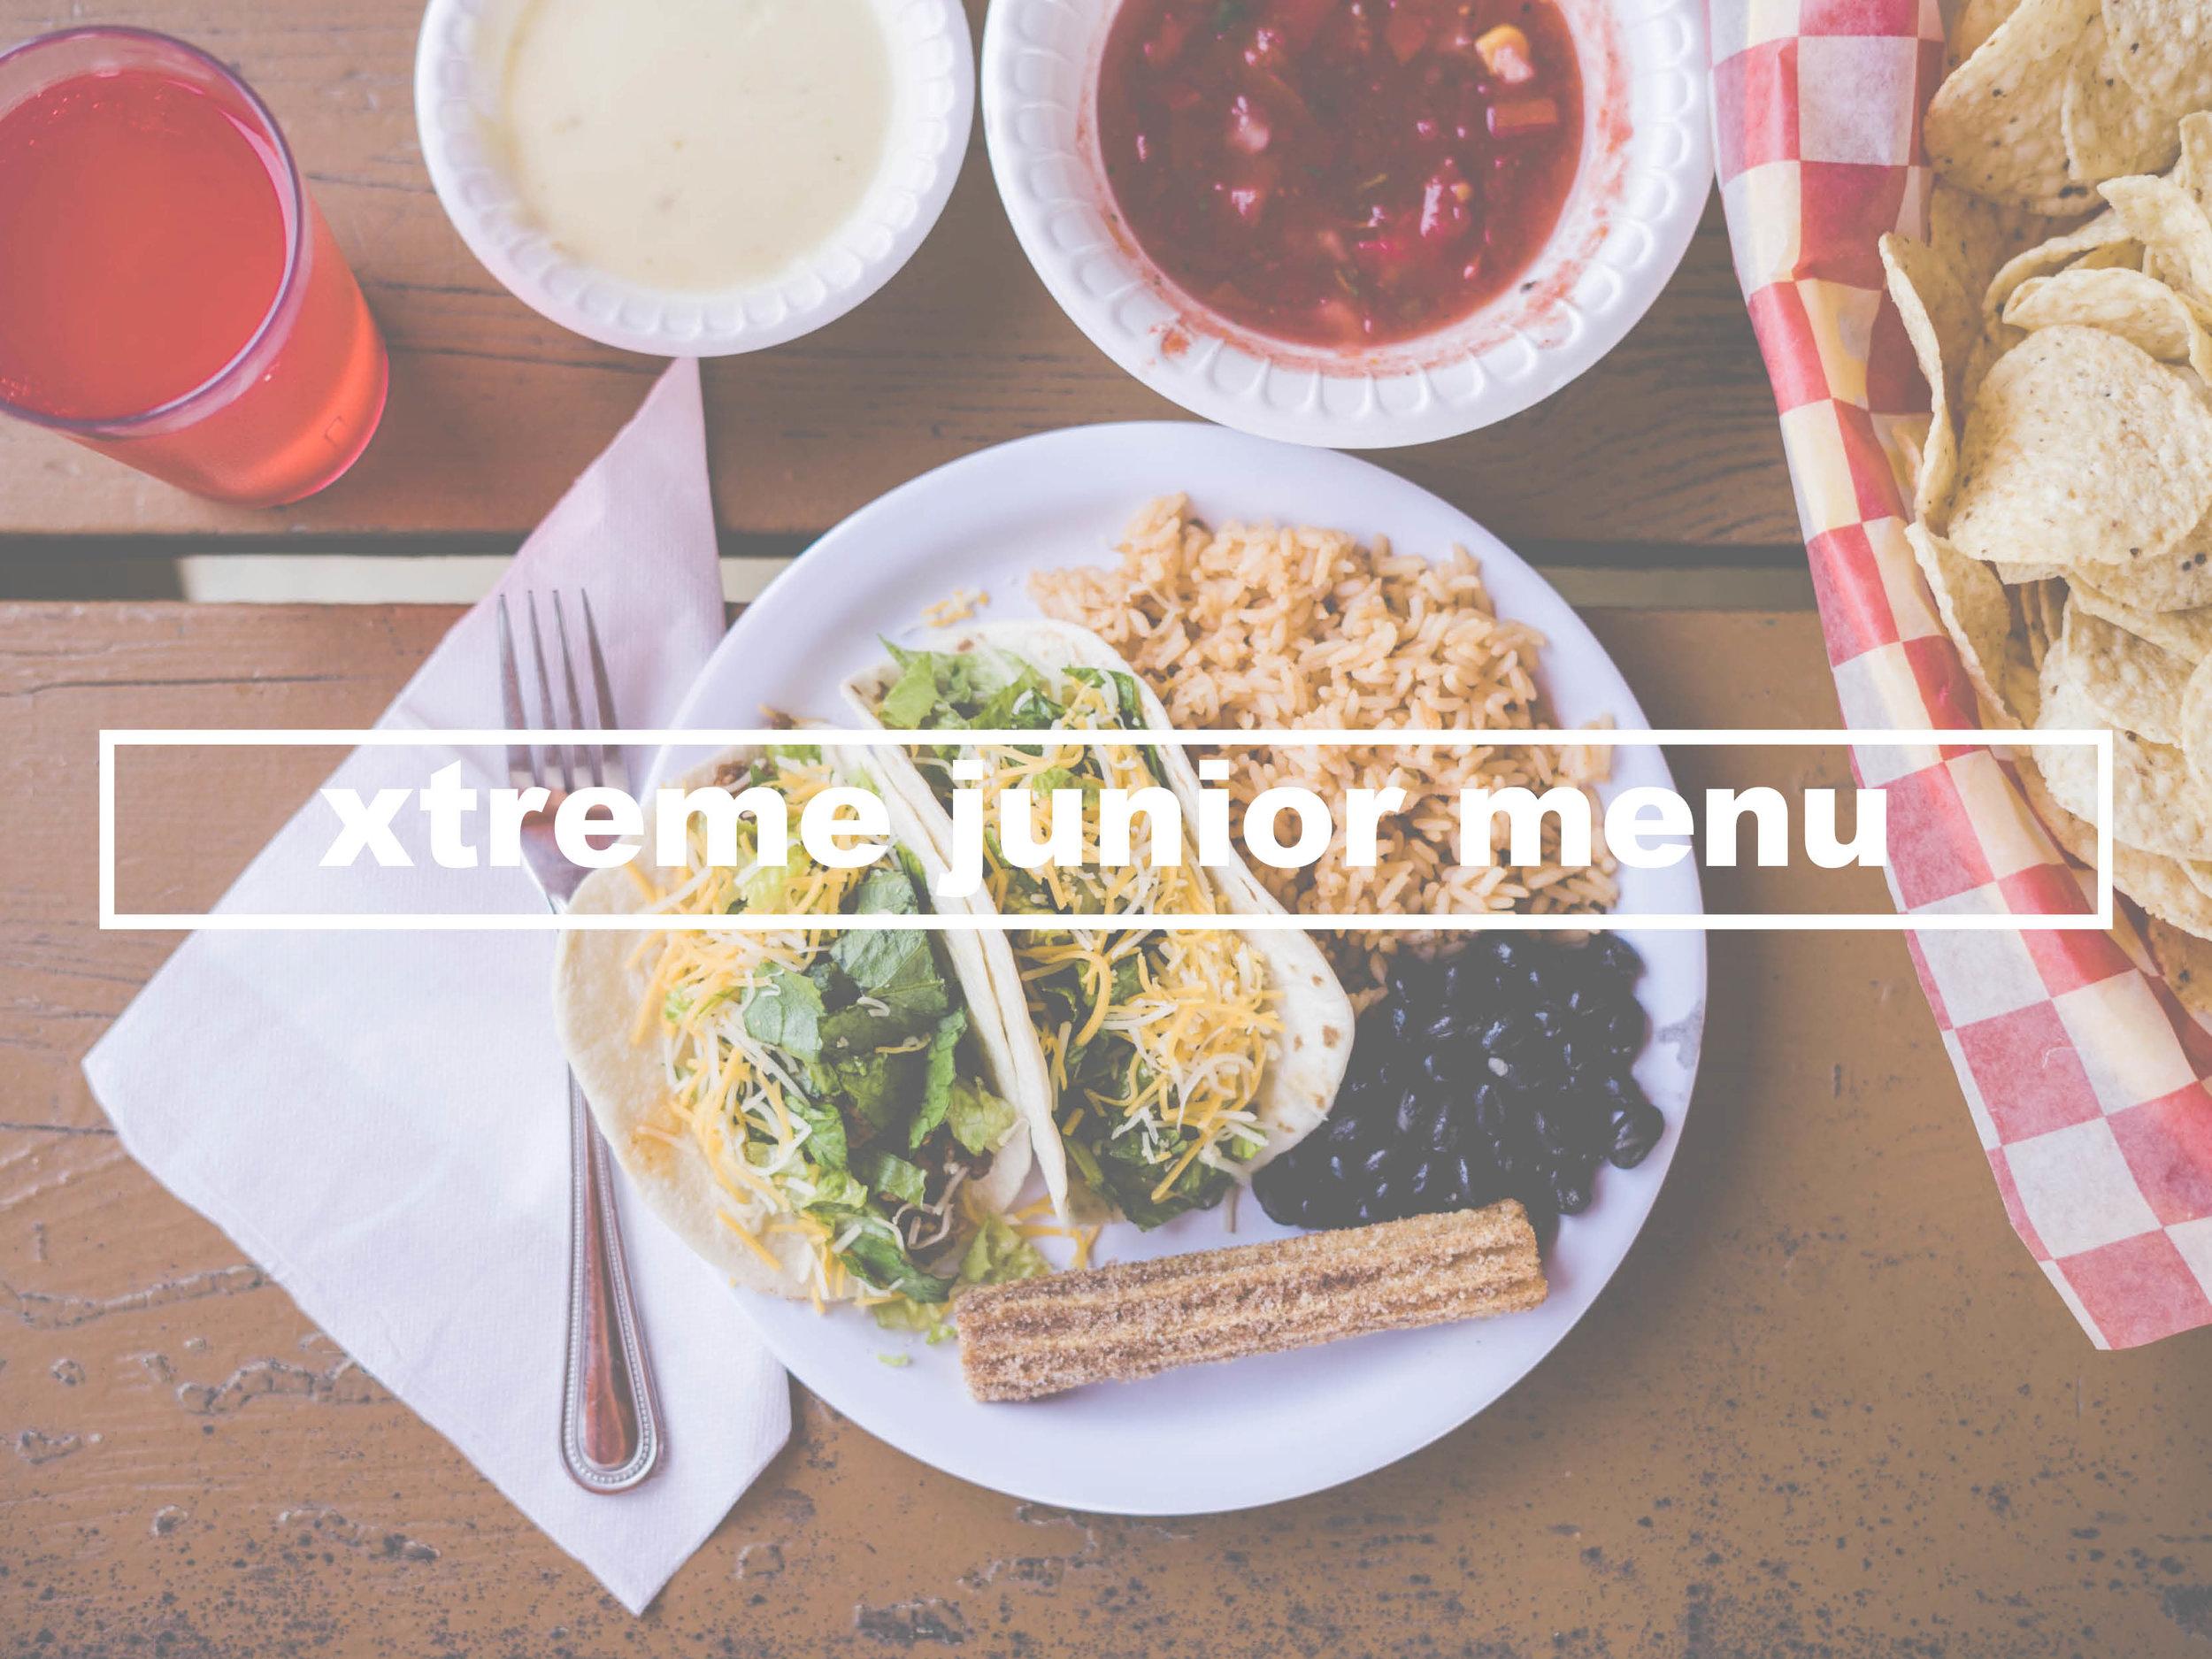 teen menu.jpg